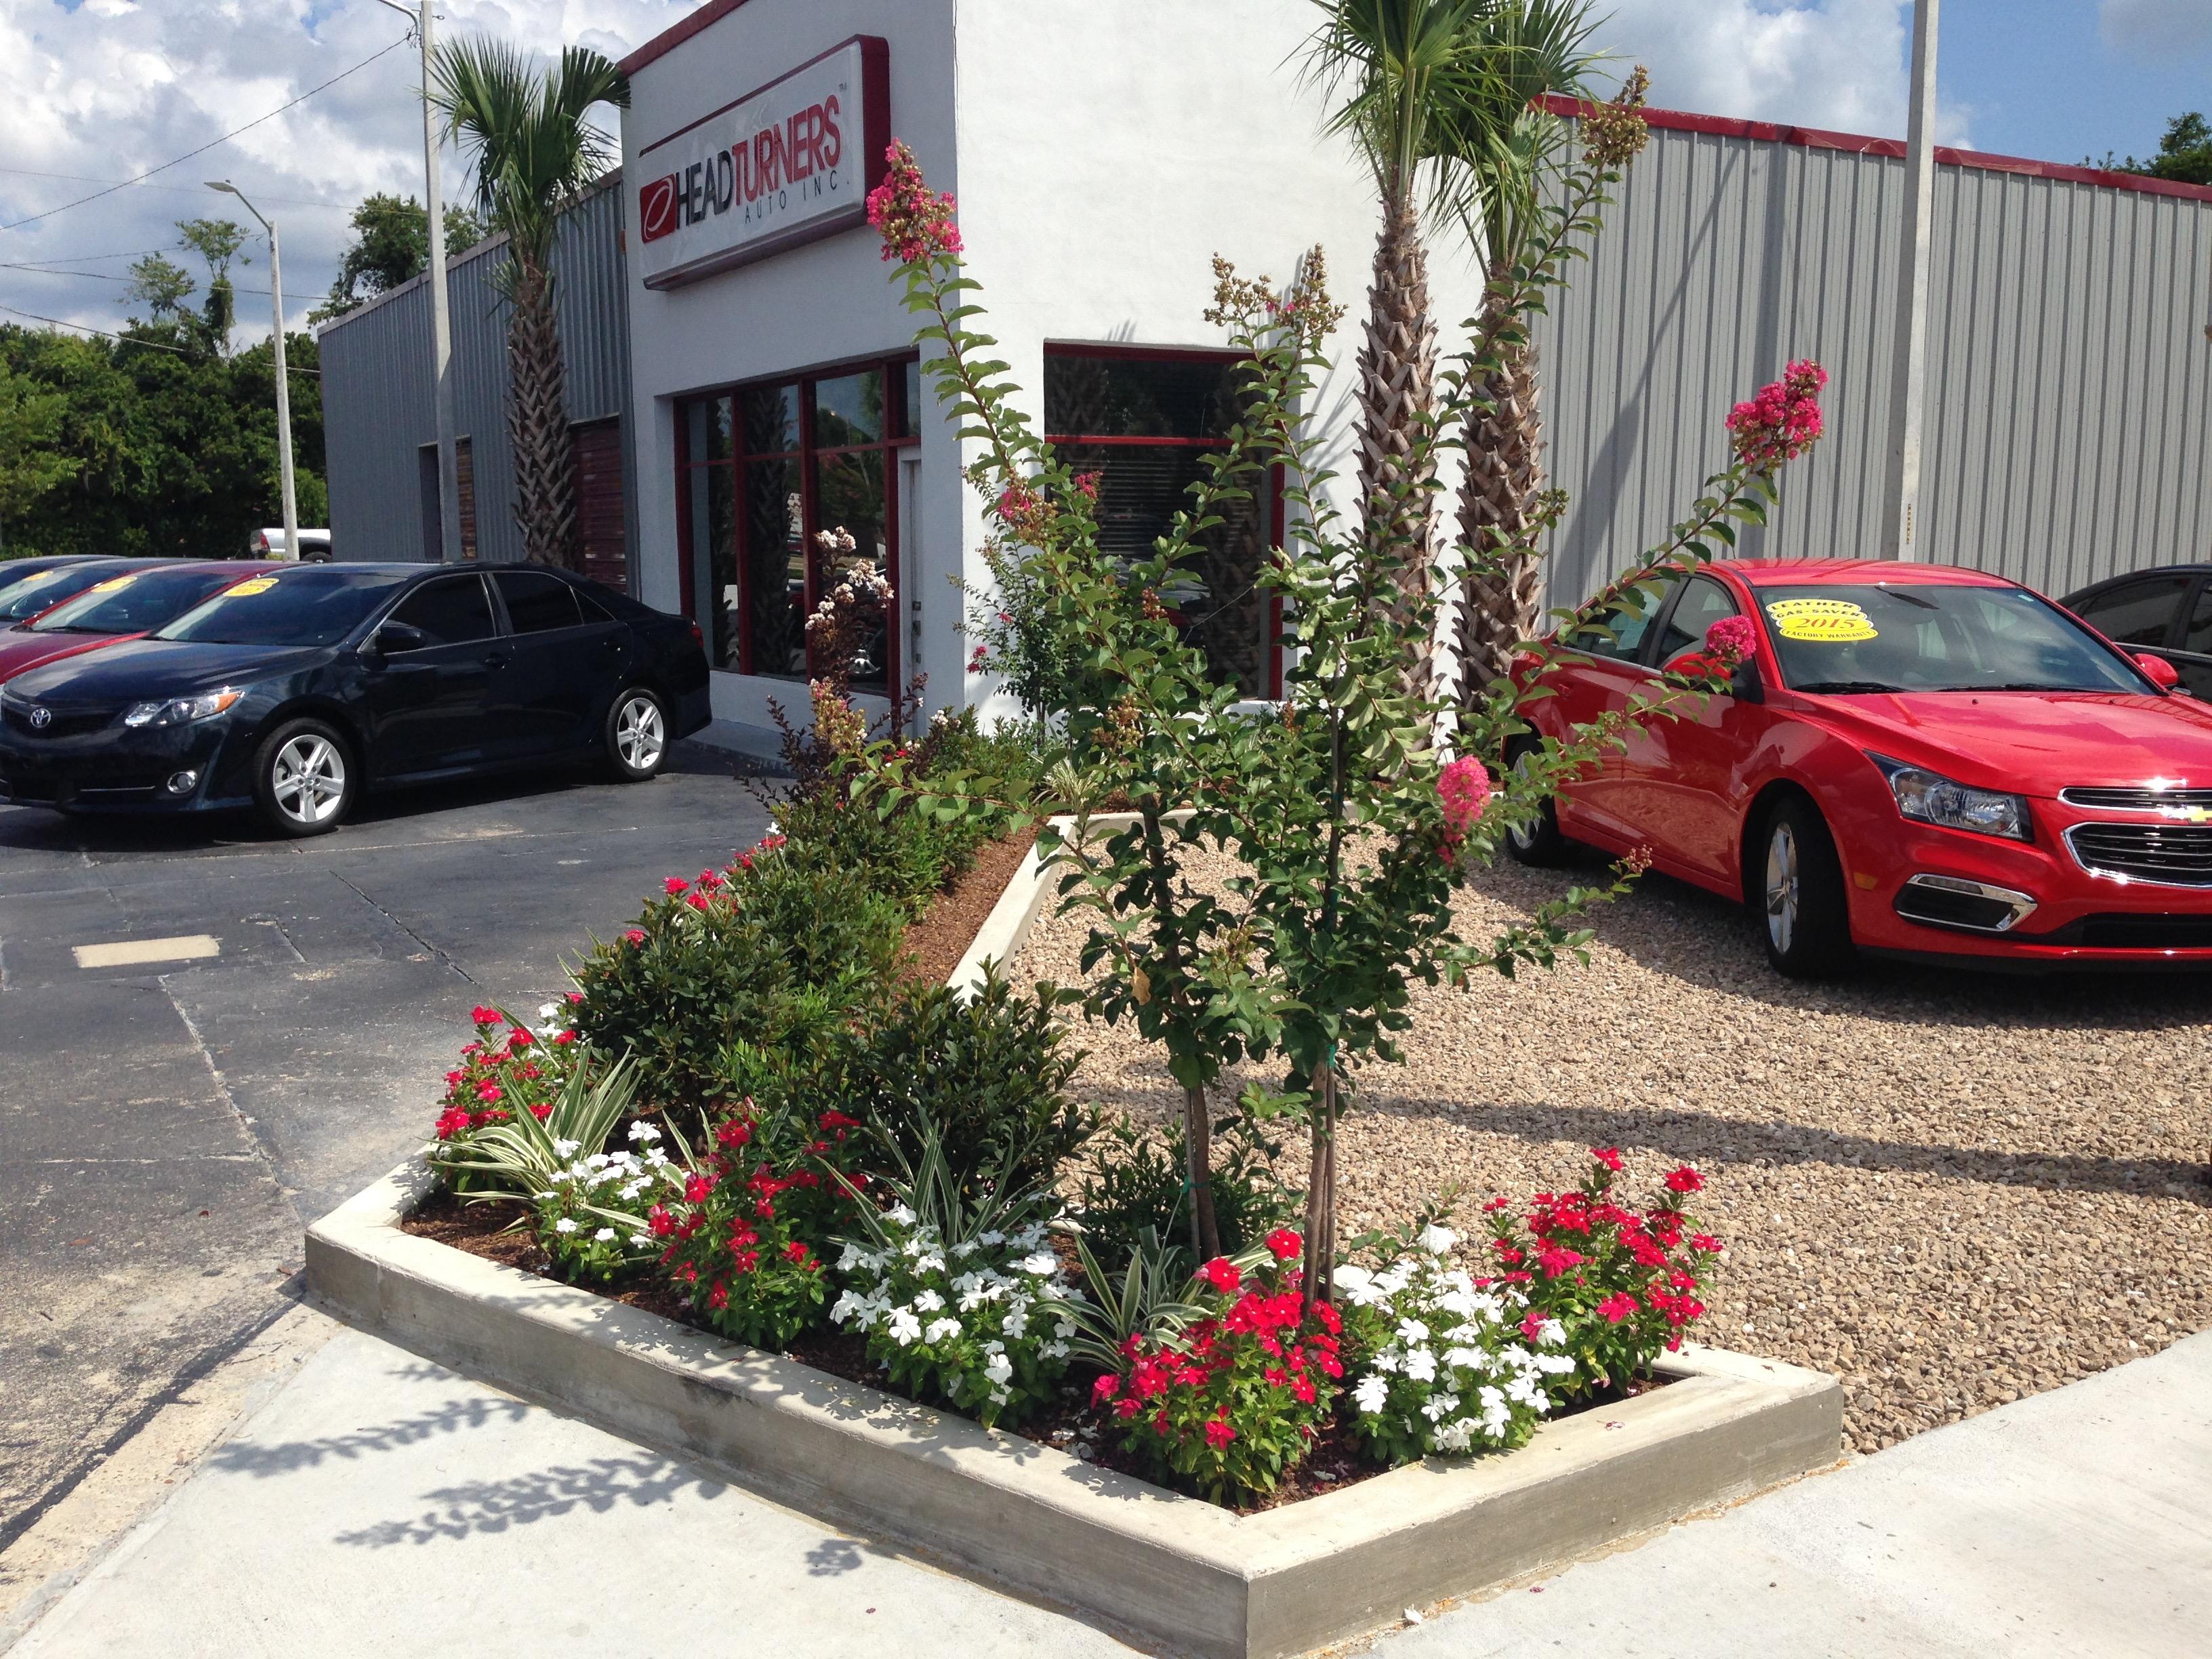 Headturners Auto Inc., Perry FL